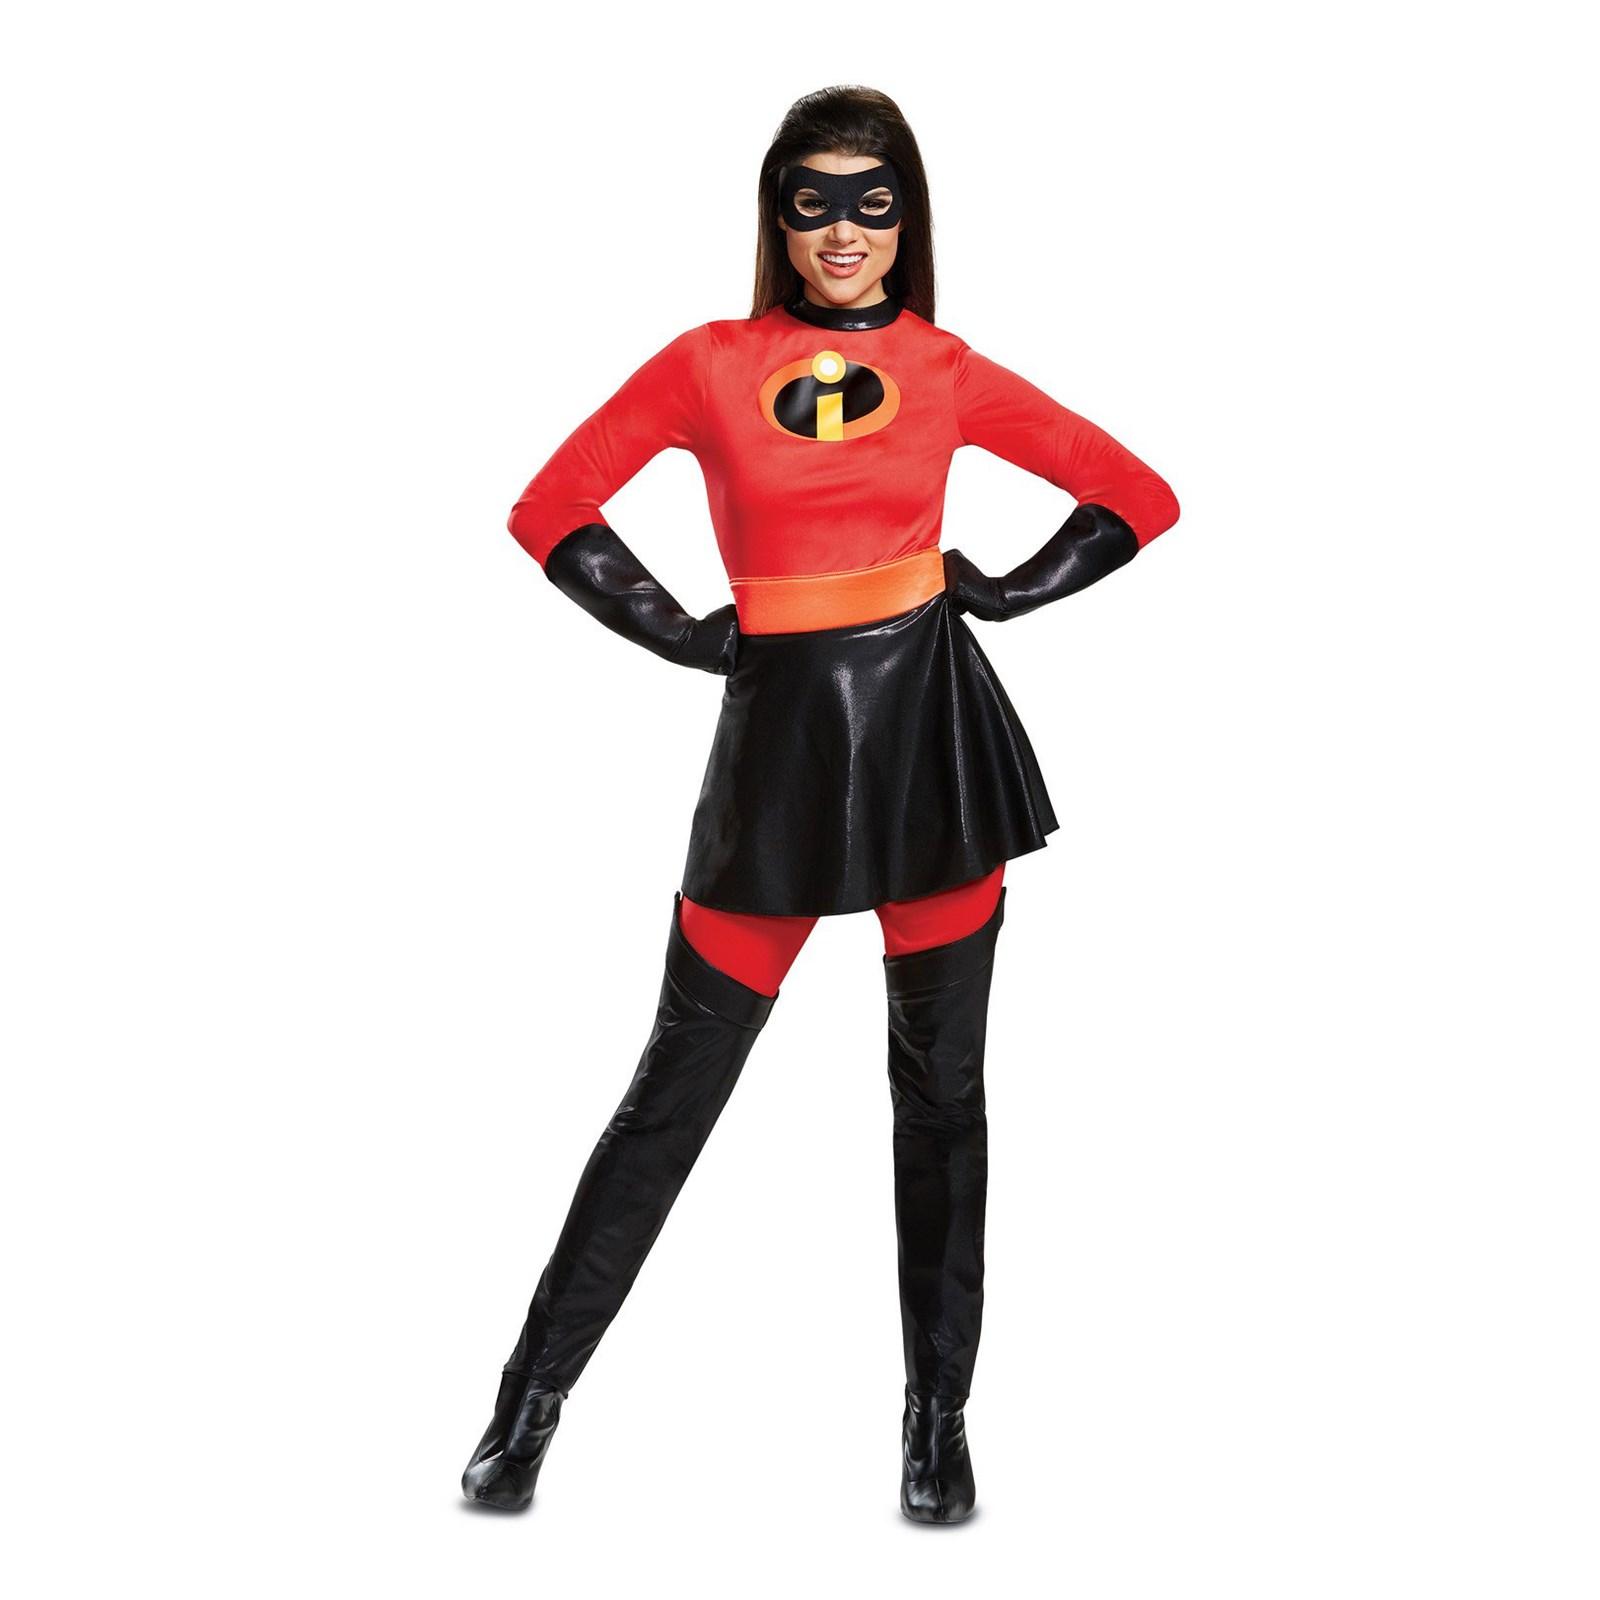 Incredibles 2 Mrs. Incredible Skirted Deluxe Adult Halloween Costume